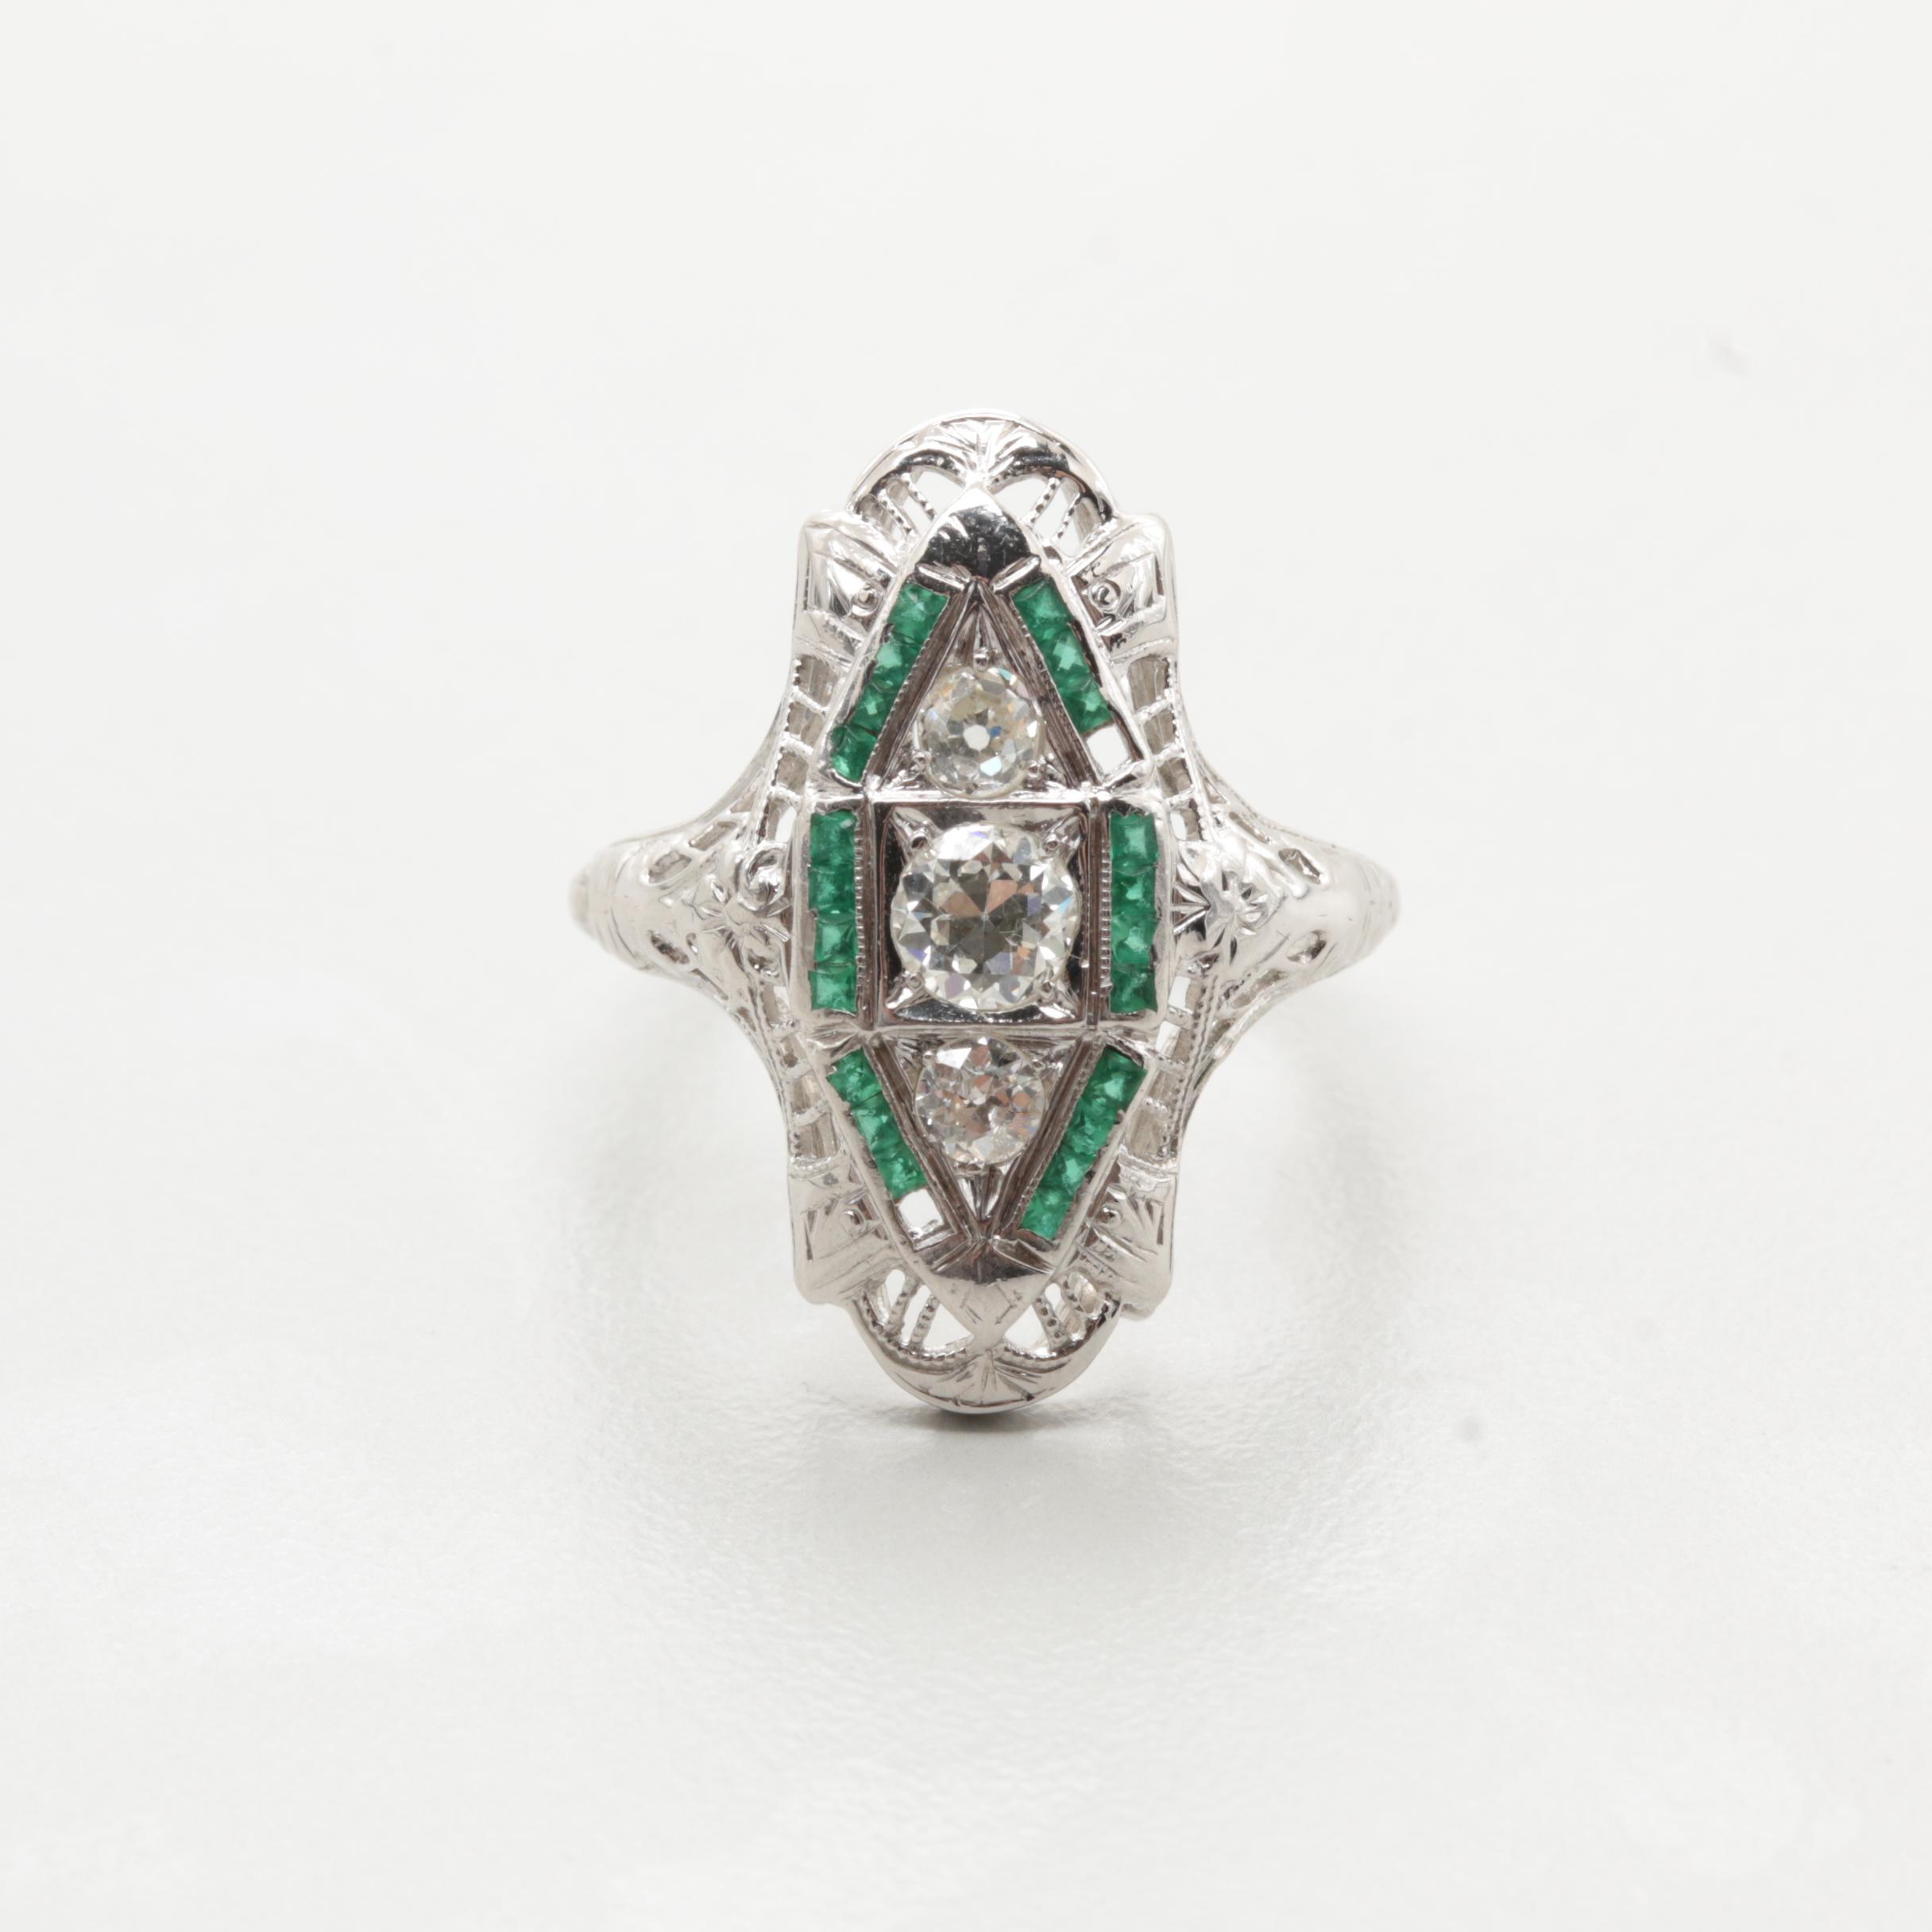 Art Deco 18K White Gold Diamond and Emerald Ring